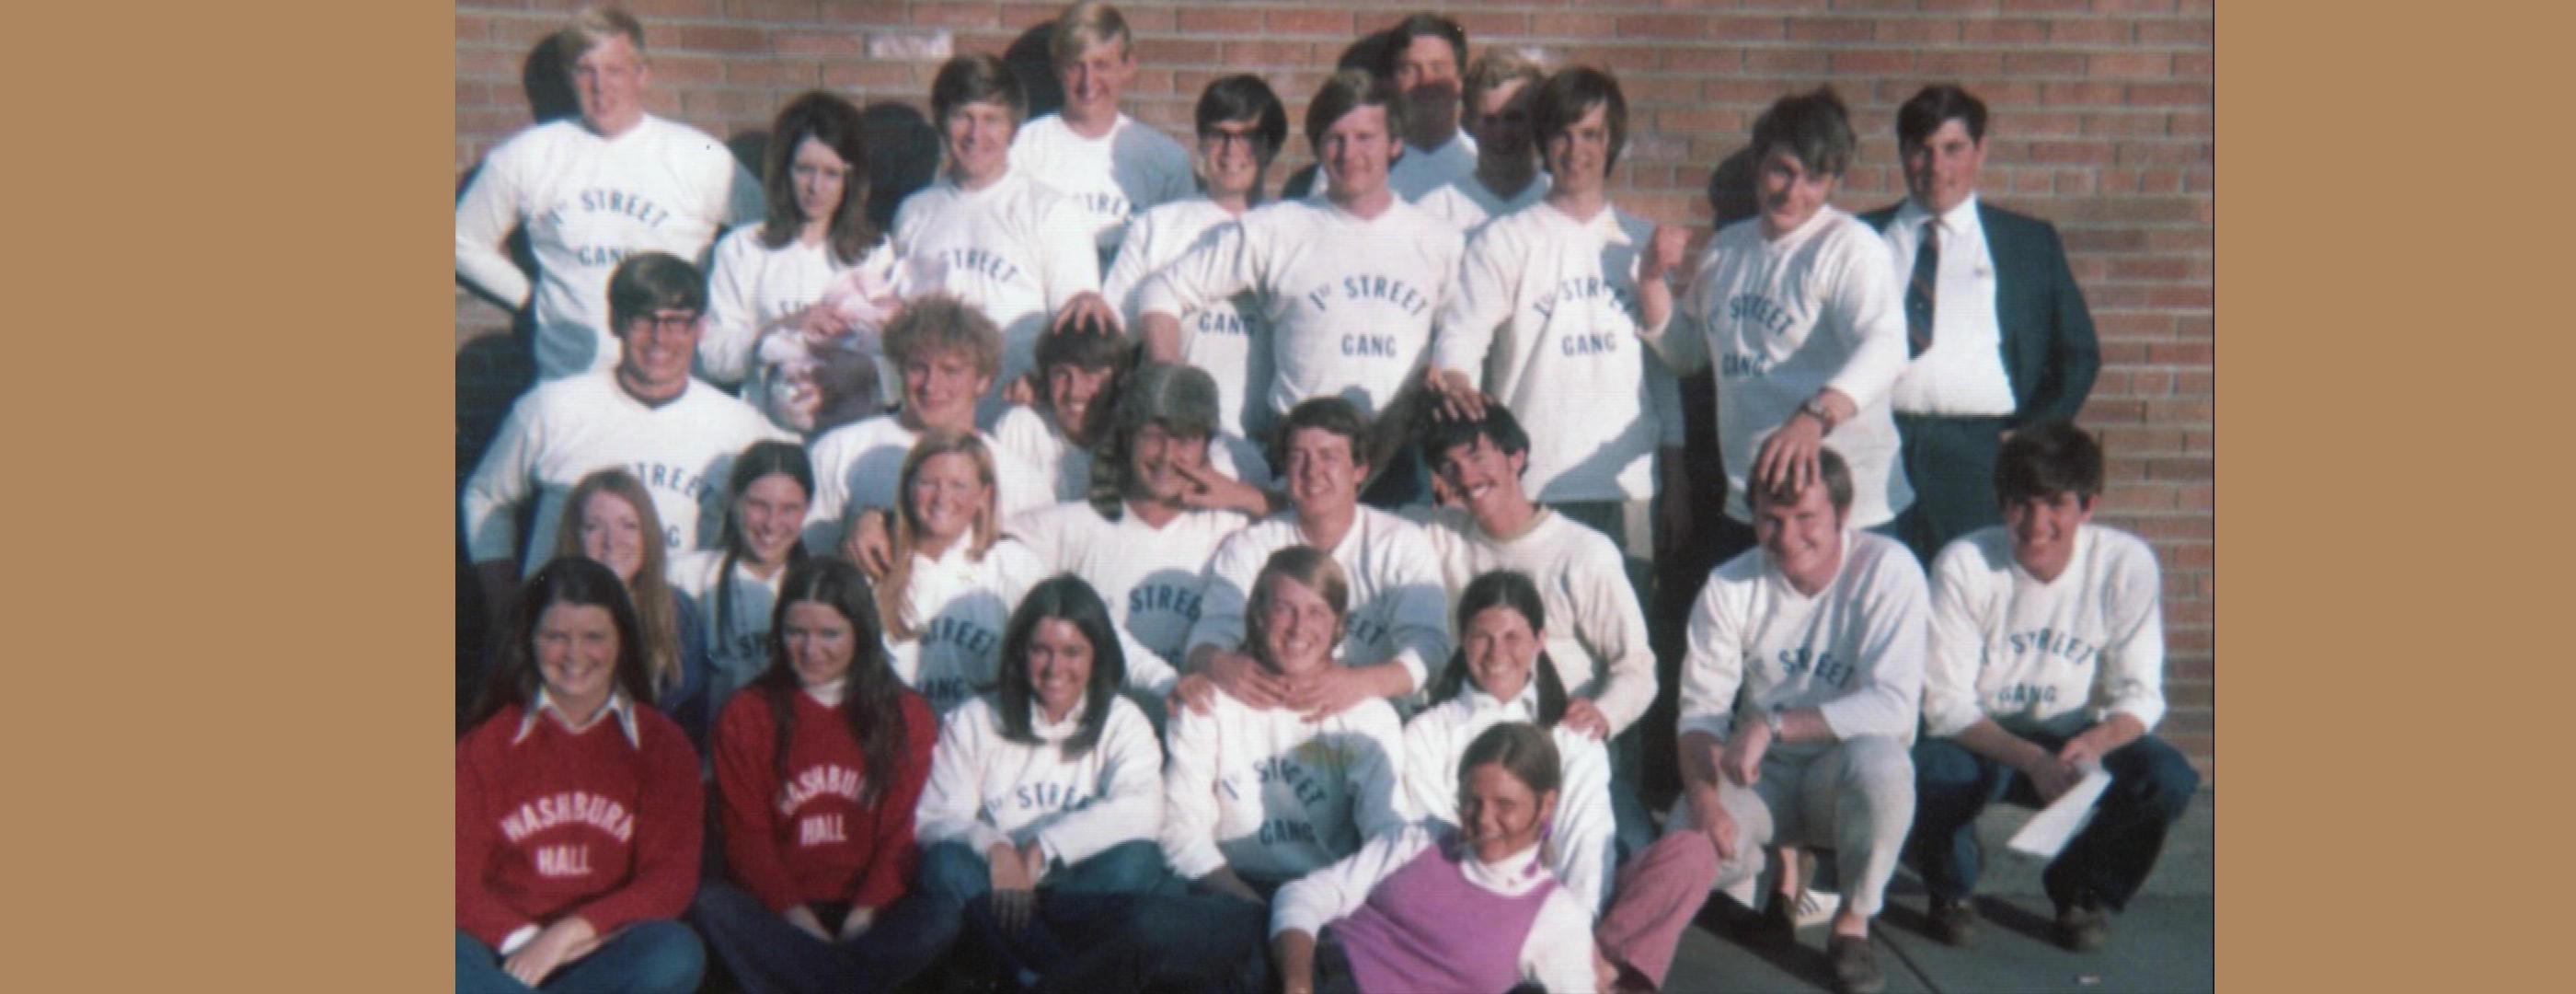 The original 1st Street Gang members